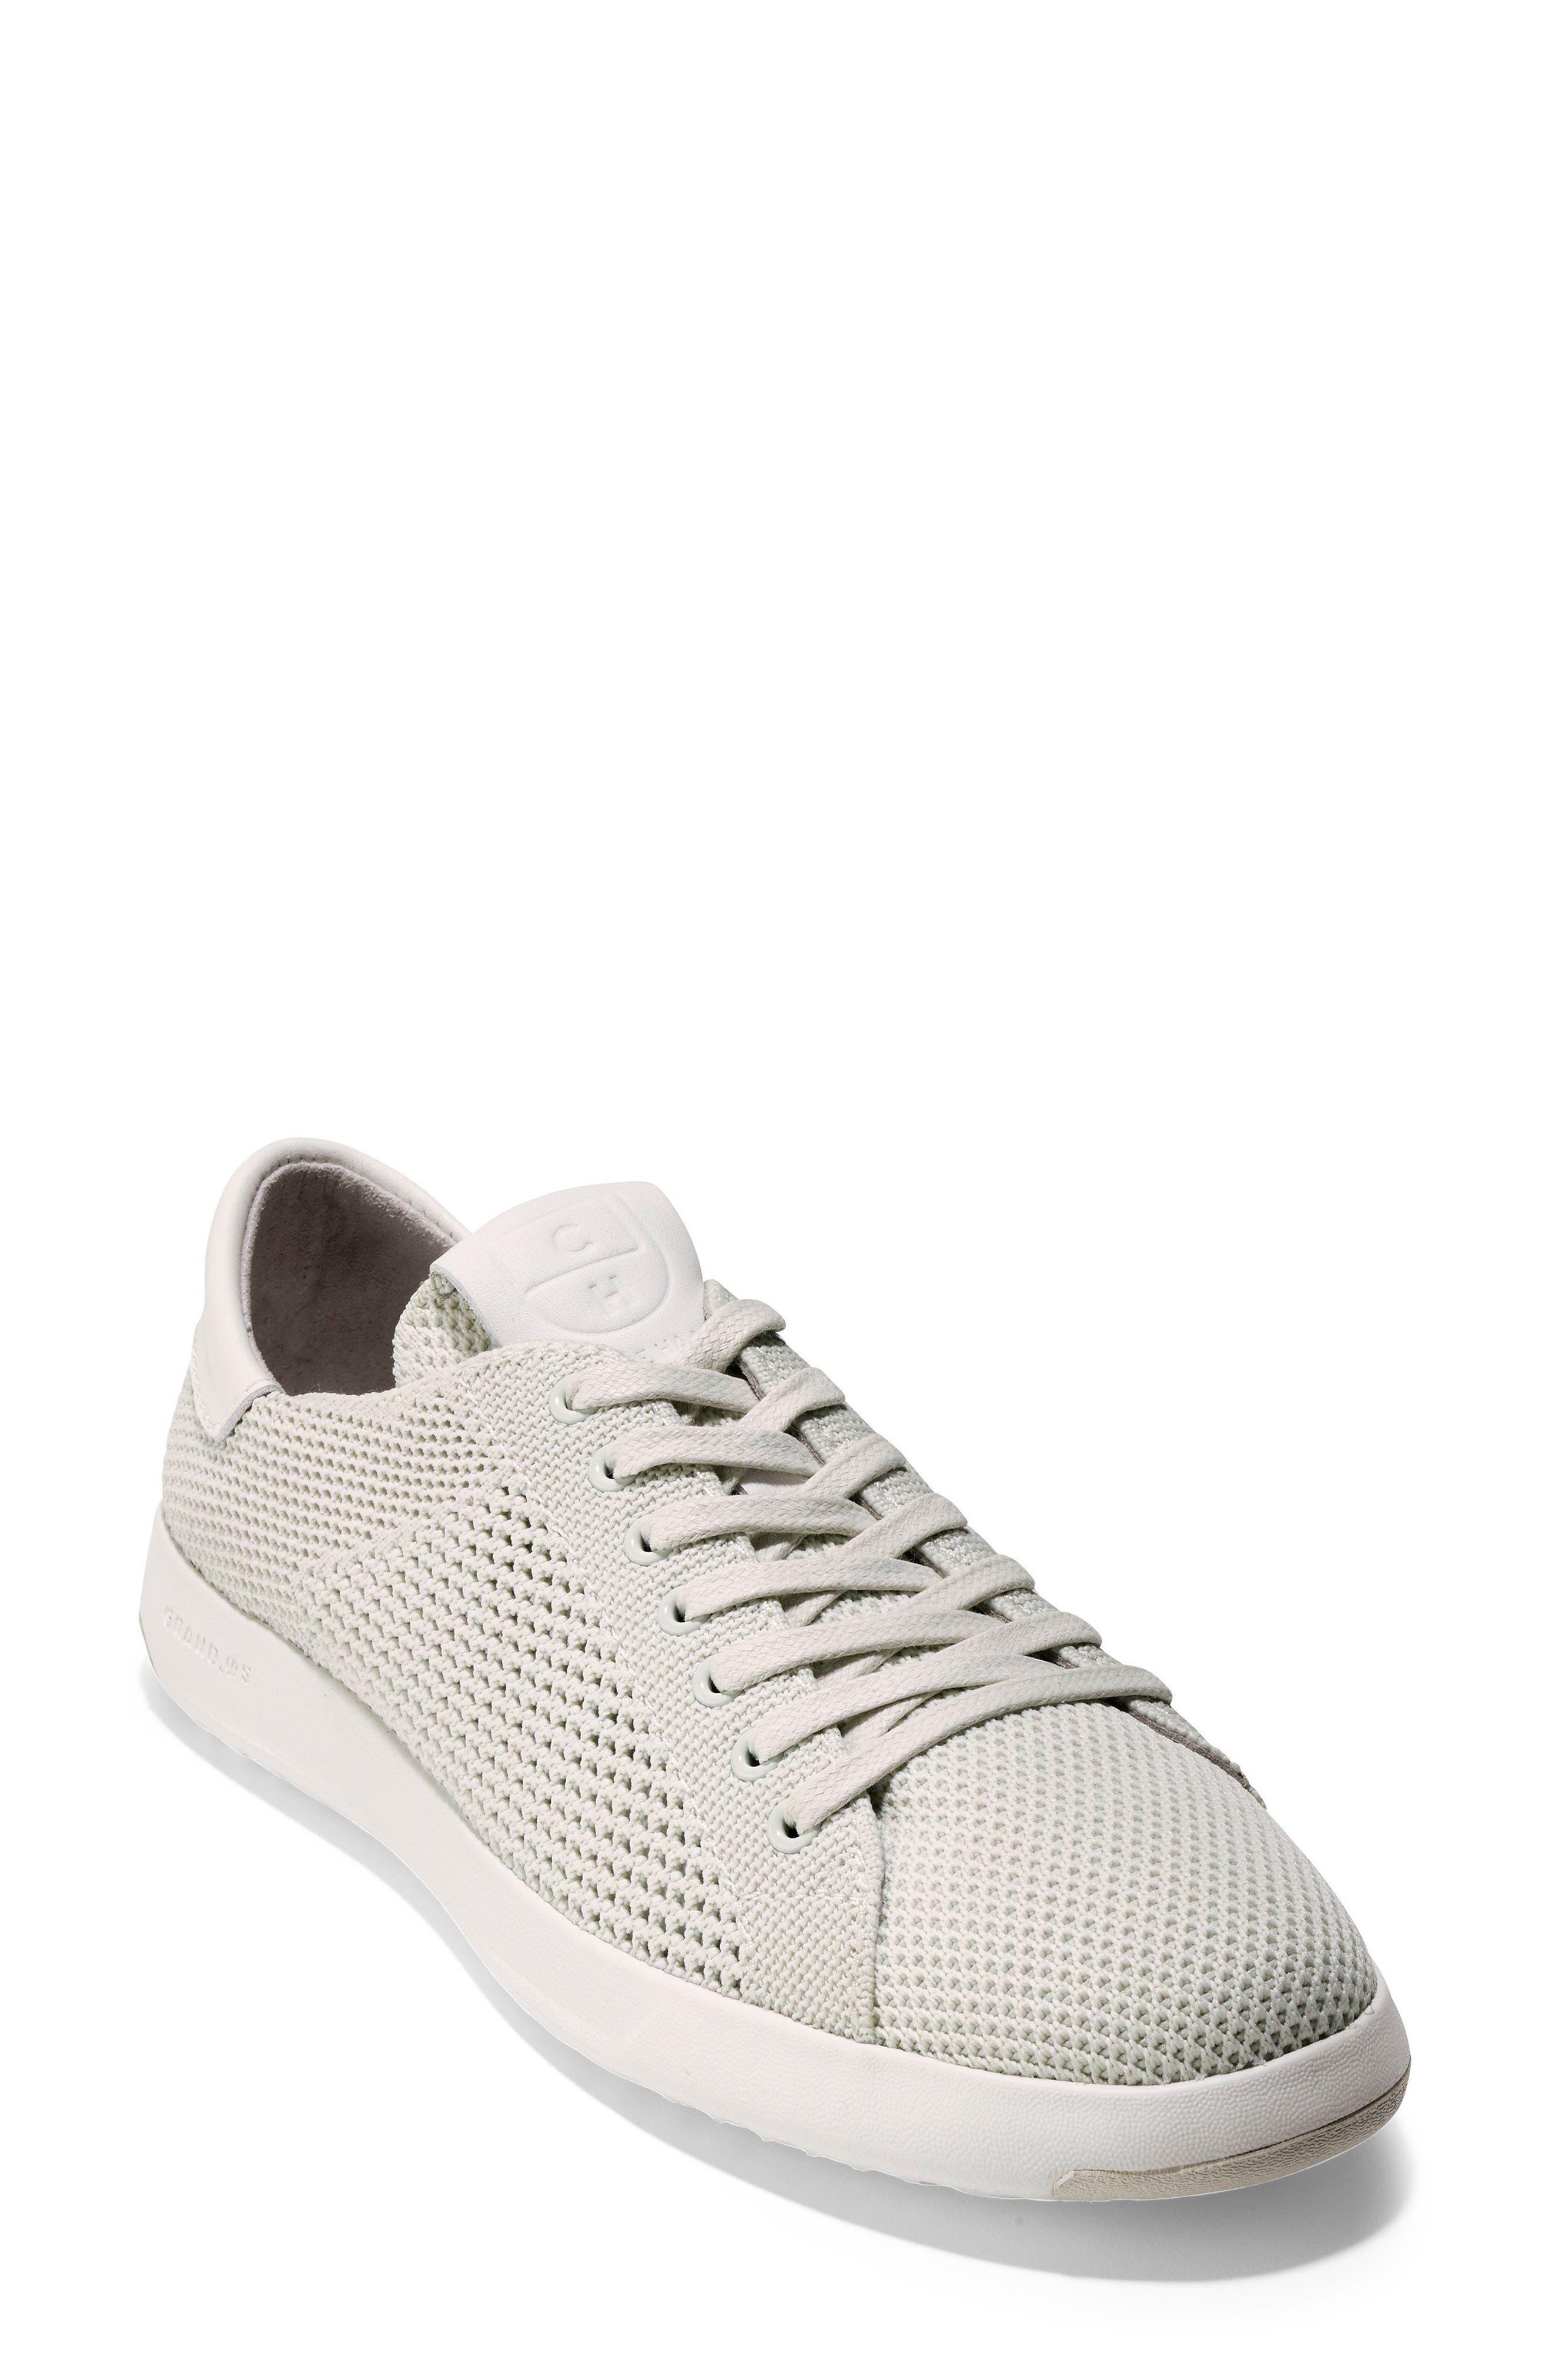 GrandPro Stitchlite Sneaker,                             Main thumbnail 1, color,                             CHALK FABRIC